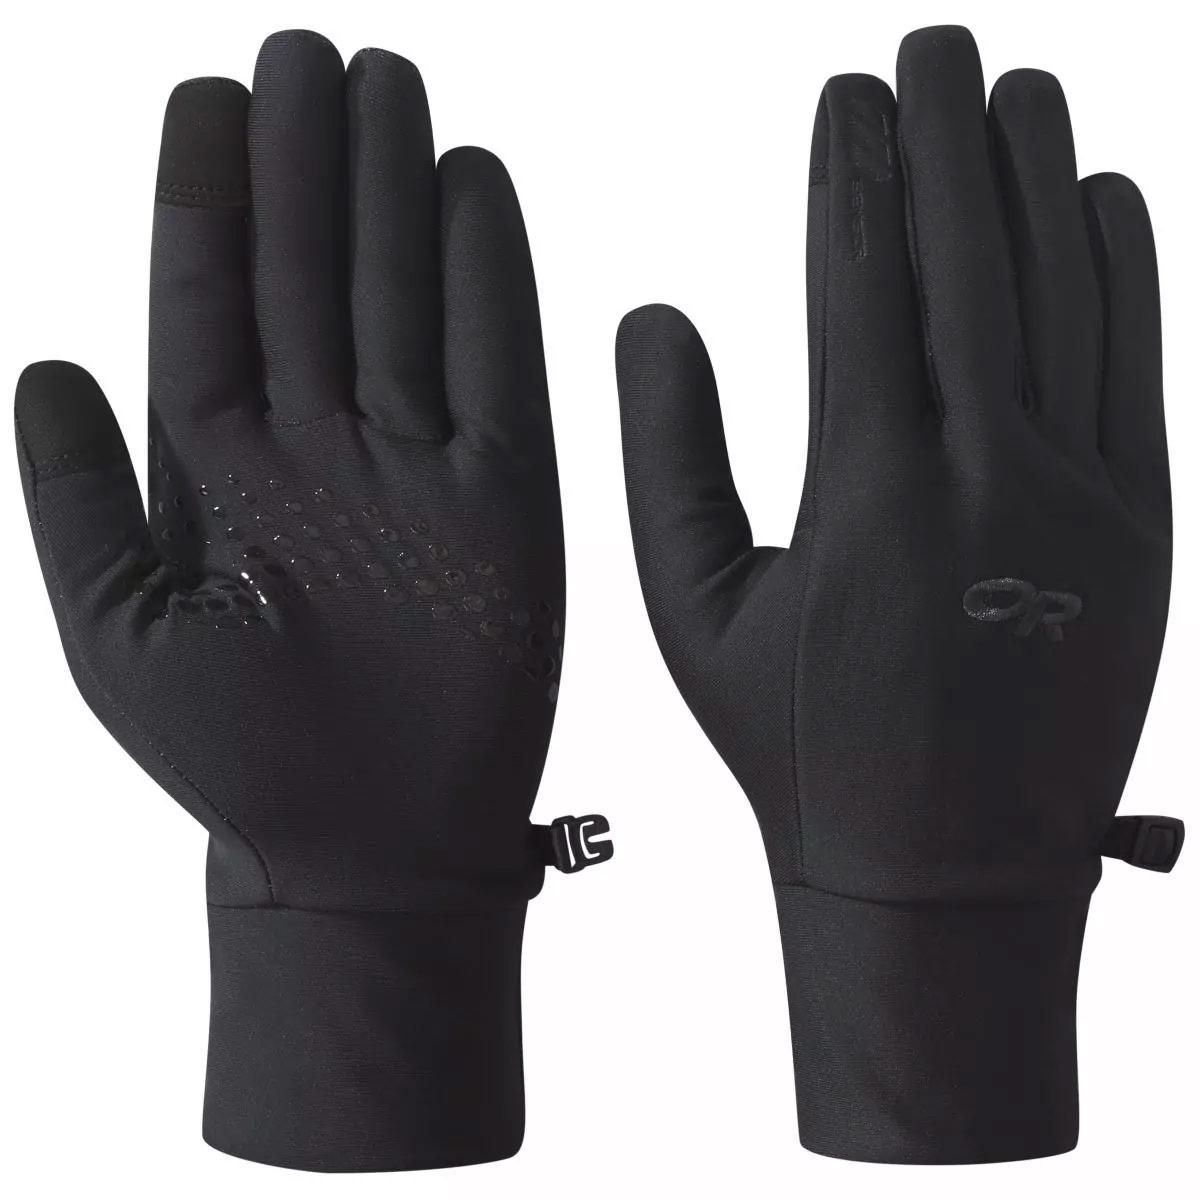 Vigor Lightweight Sensor Gloves - Men's